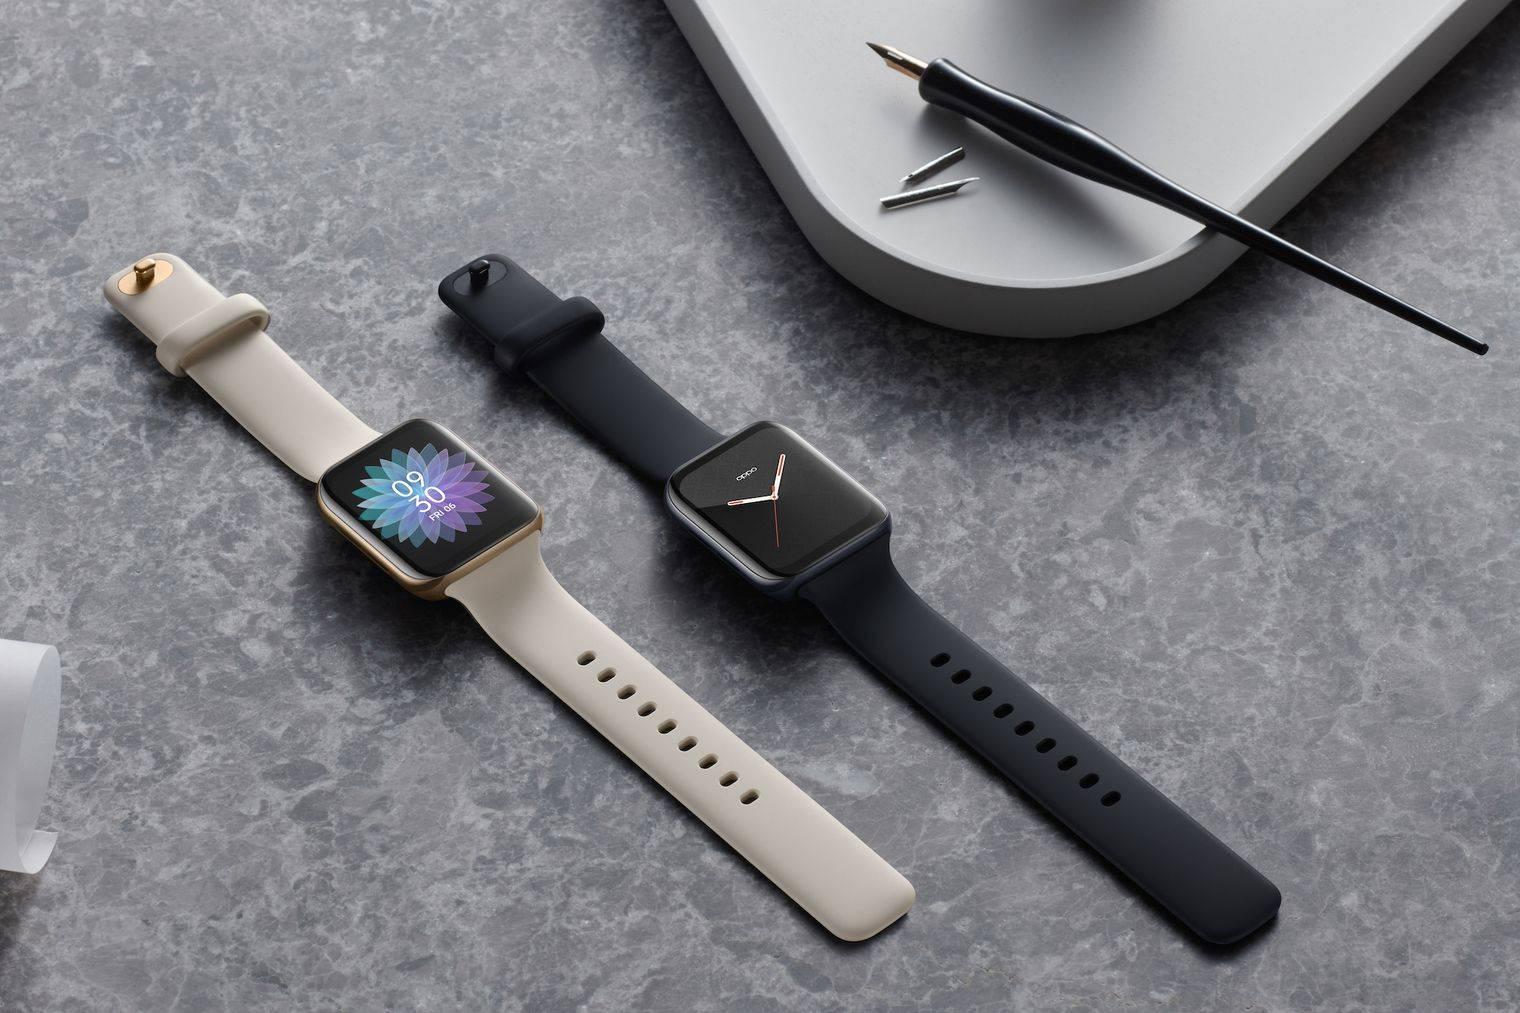 "OPPO 首款智能手表采用泰雷兹 eSIM 解决方案,让移动网络连接触""手""可及"